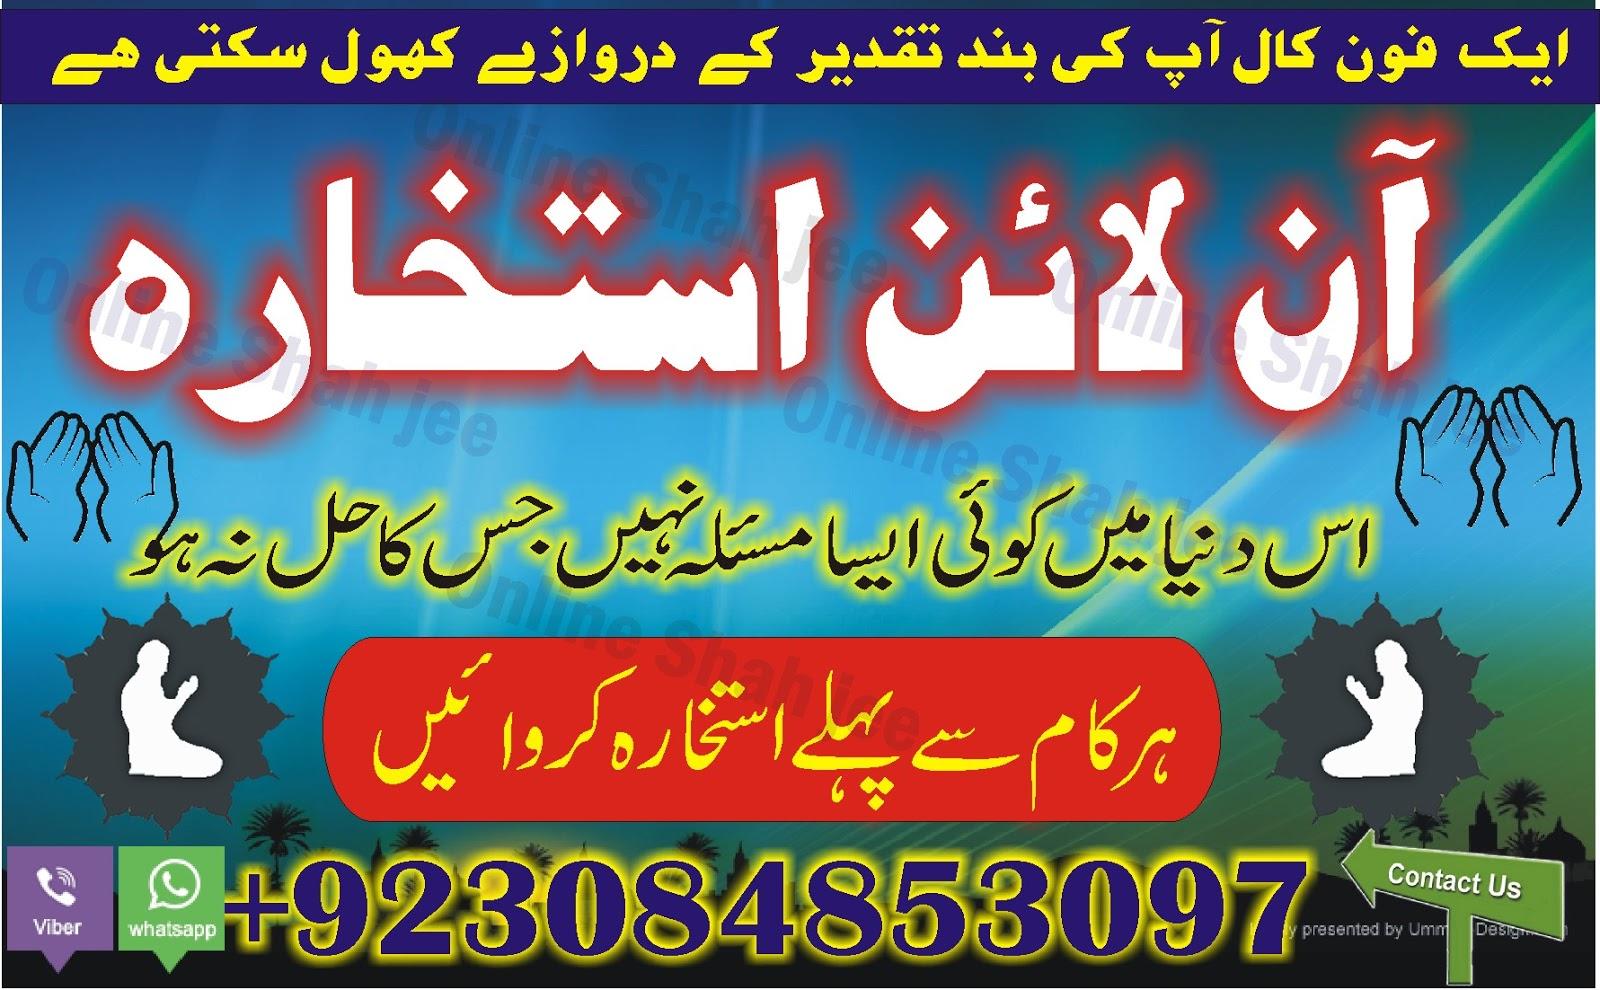 Rohani illaj Centar: ISTIKHARA Dua Center   Wazifa Dua Center  Free